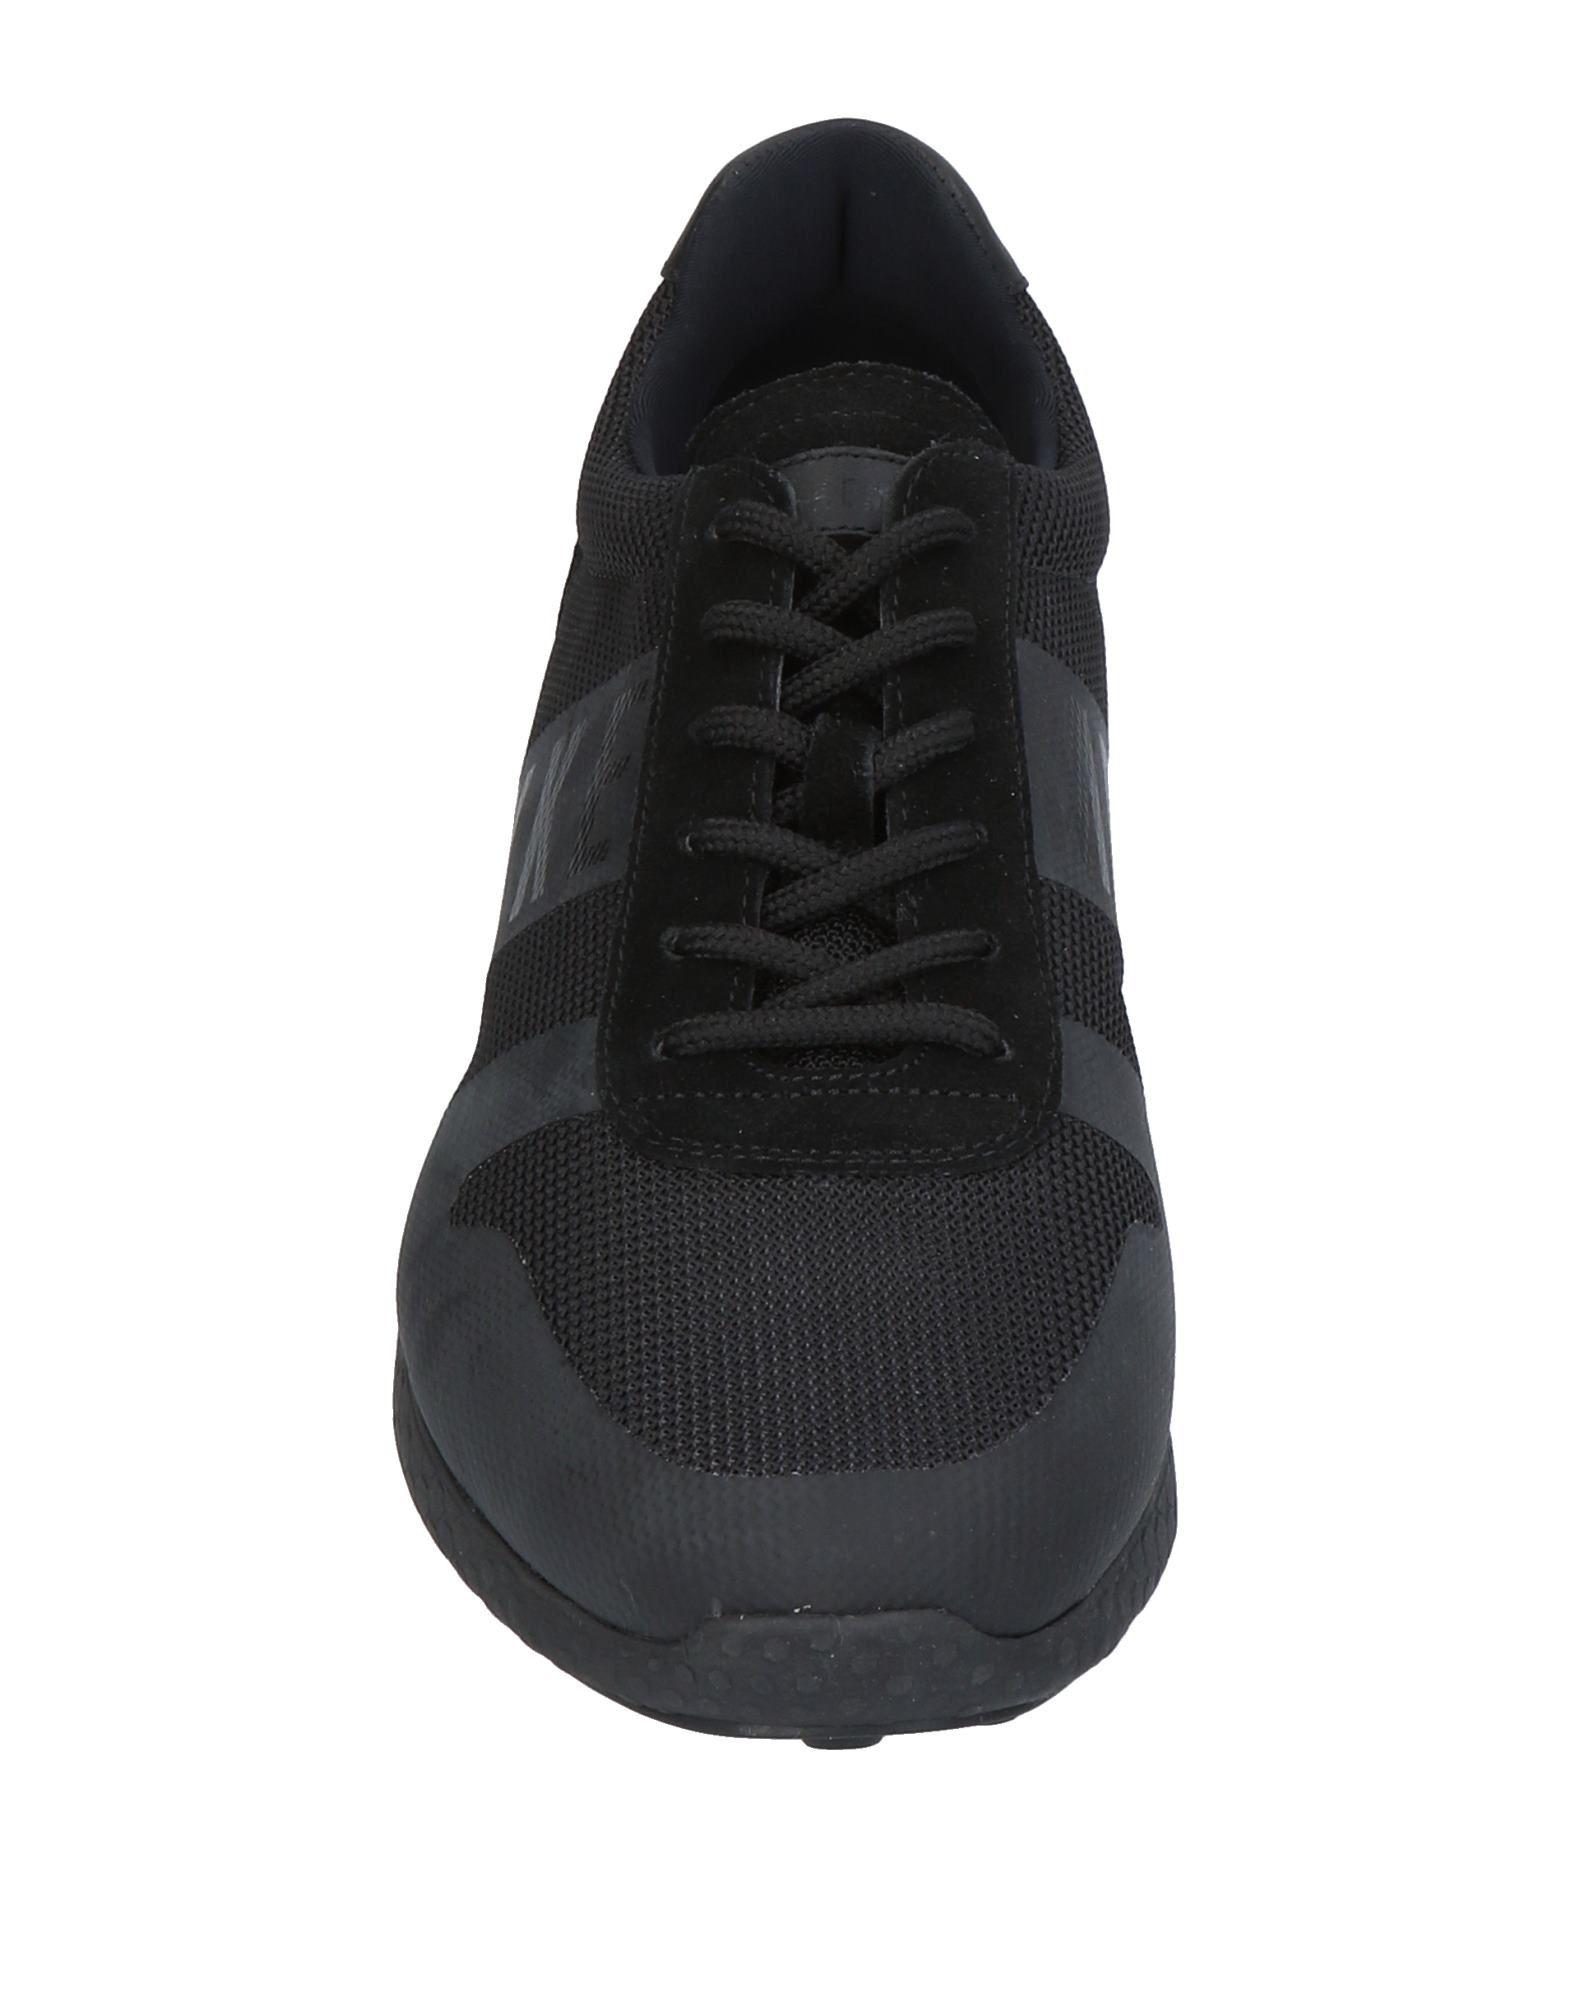 Bikkembergs Gute Sneakers Herren  11450740HS Gute Bikkembergs Qualität beliebte Schuhe 30dad2